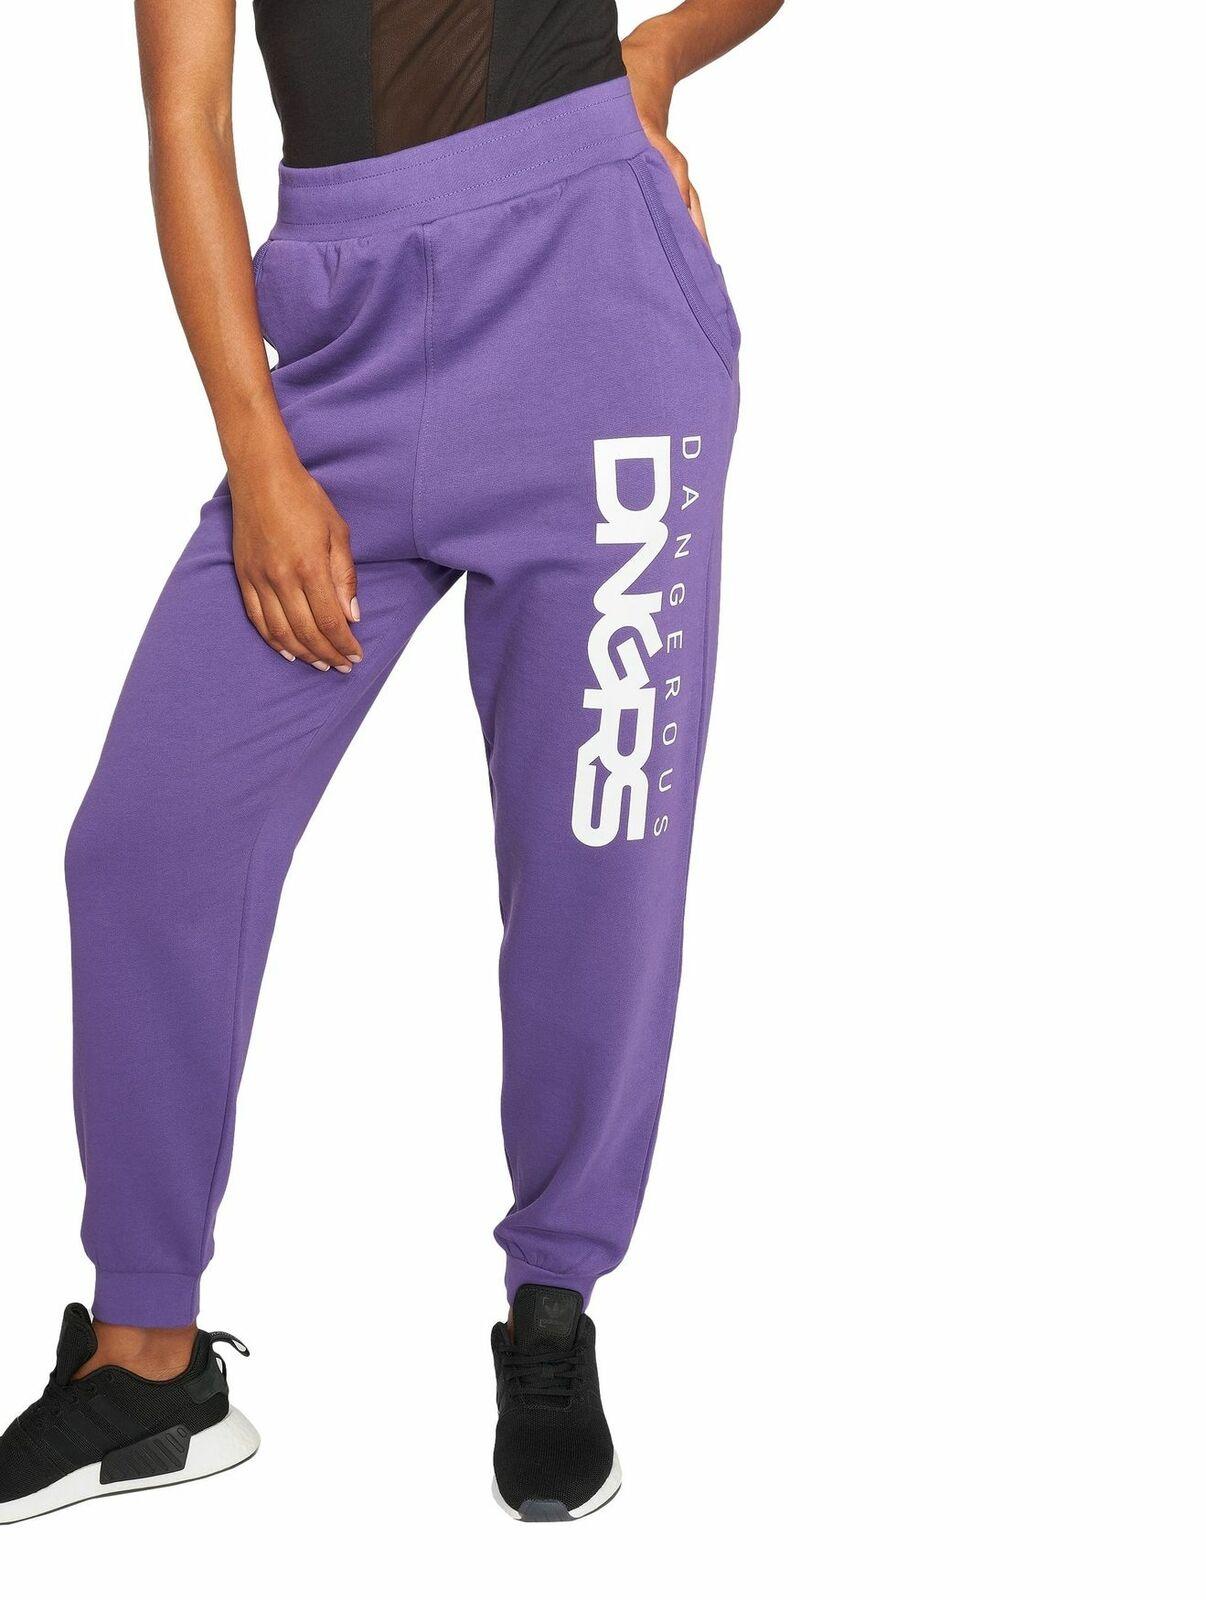 Damen Jogginghose Soft Dream DNGRS Sweat Pants Sport Fitness Urban Baggy Hose